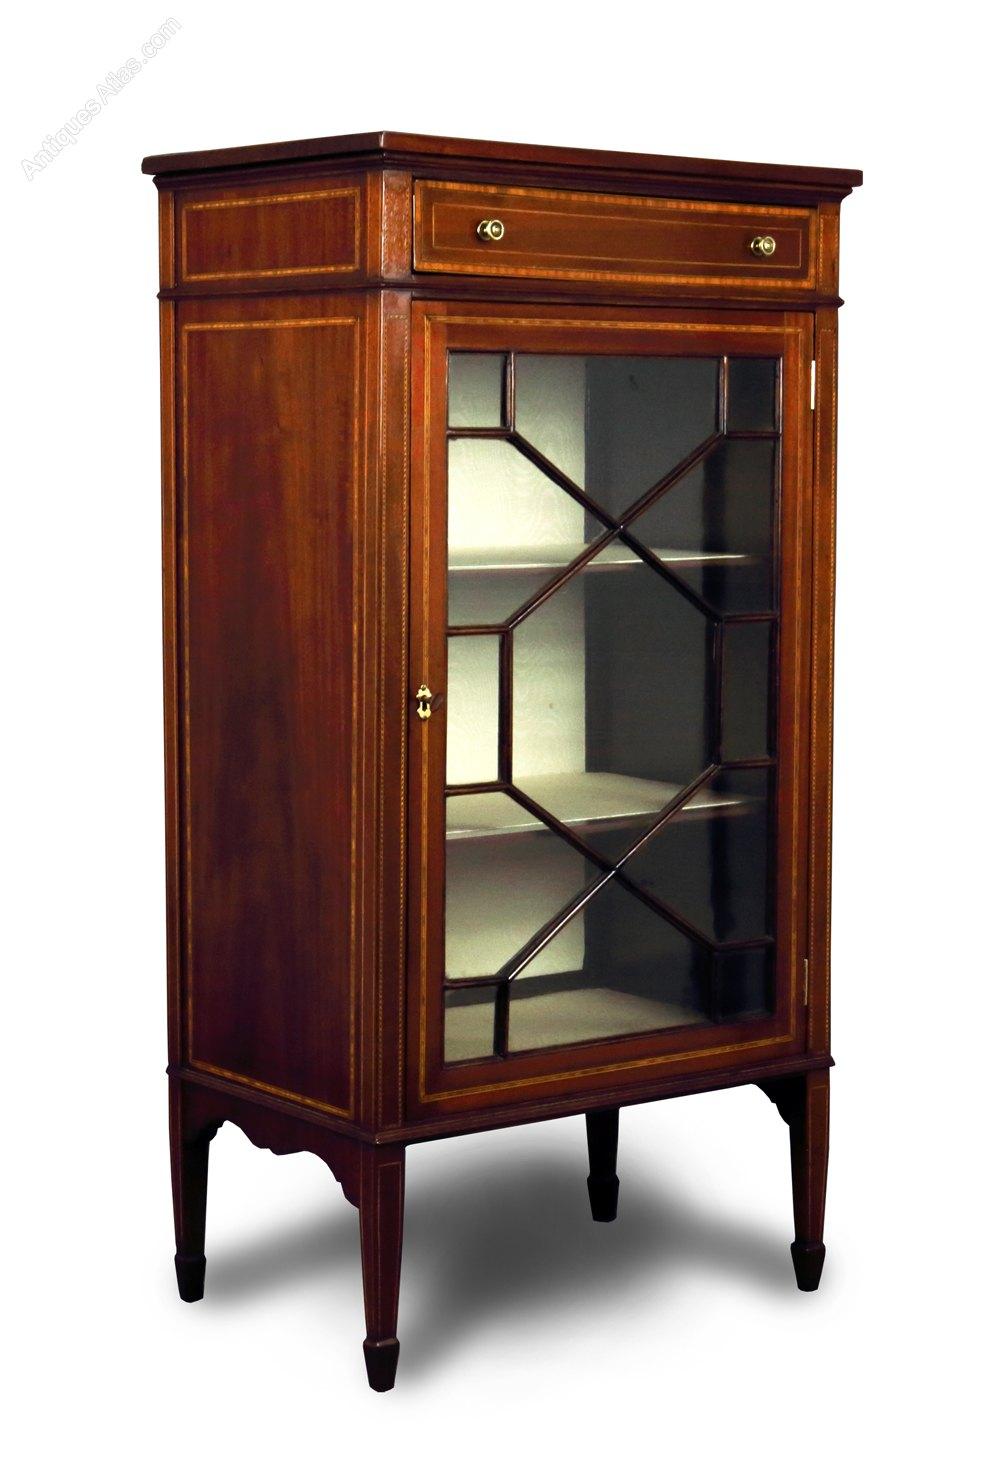 Mahogany Amp Inlaid Small Display Cabinet Antiques Atlas